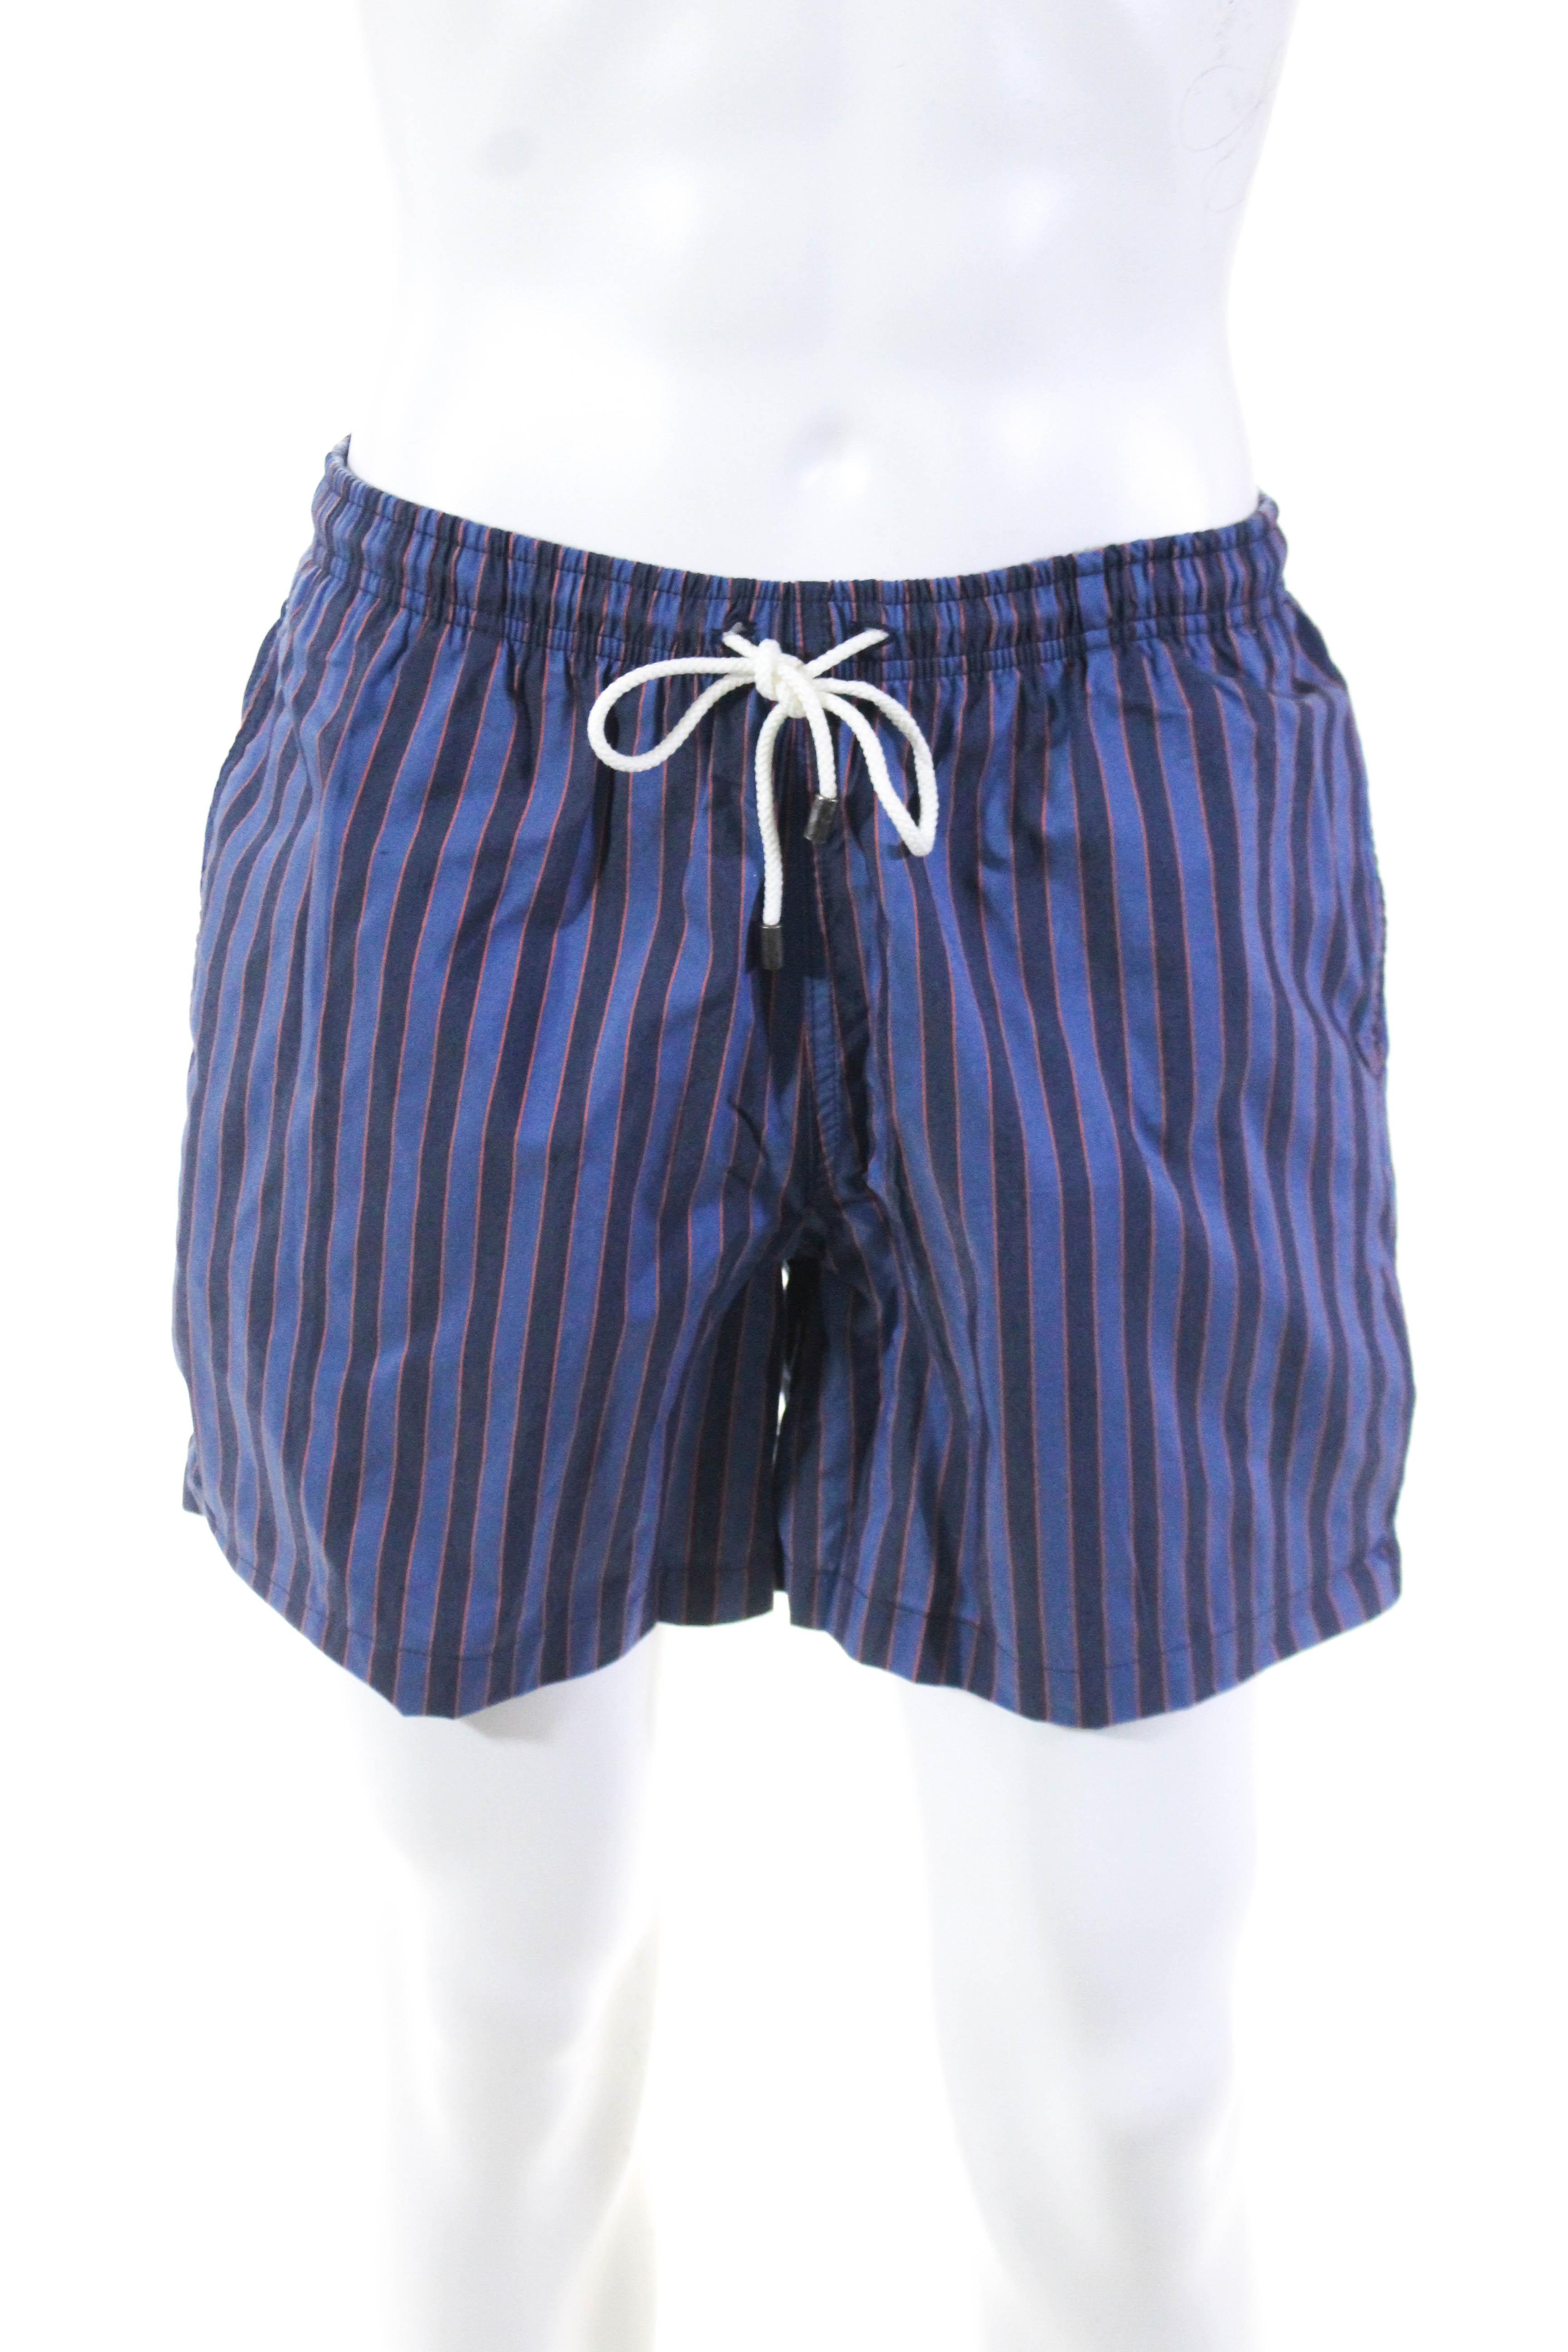 c2746131a0 Solid & Striped Mens Classic Amalfi Stripe Swim Trunks Blue Size ...